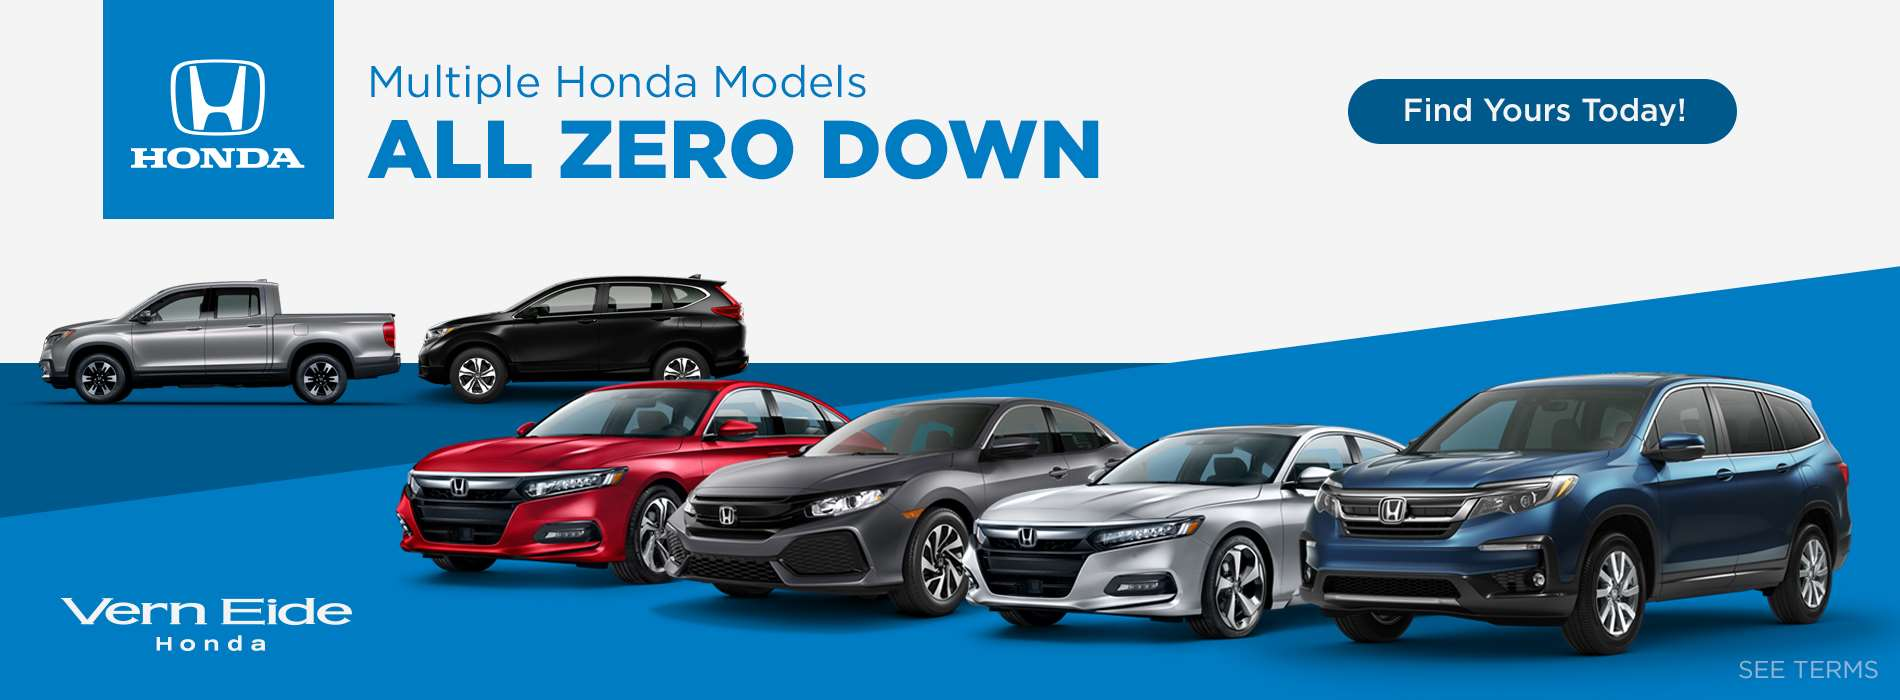 Multiple Models Zero Down - Nov 2018